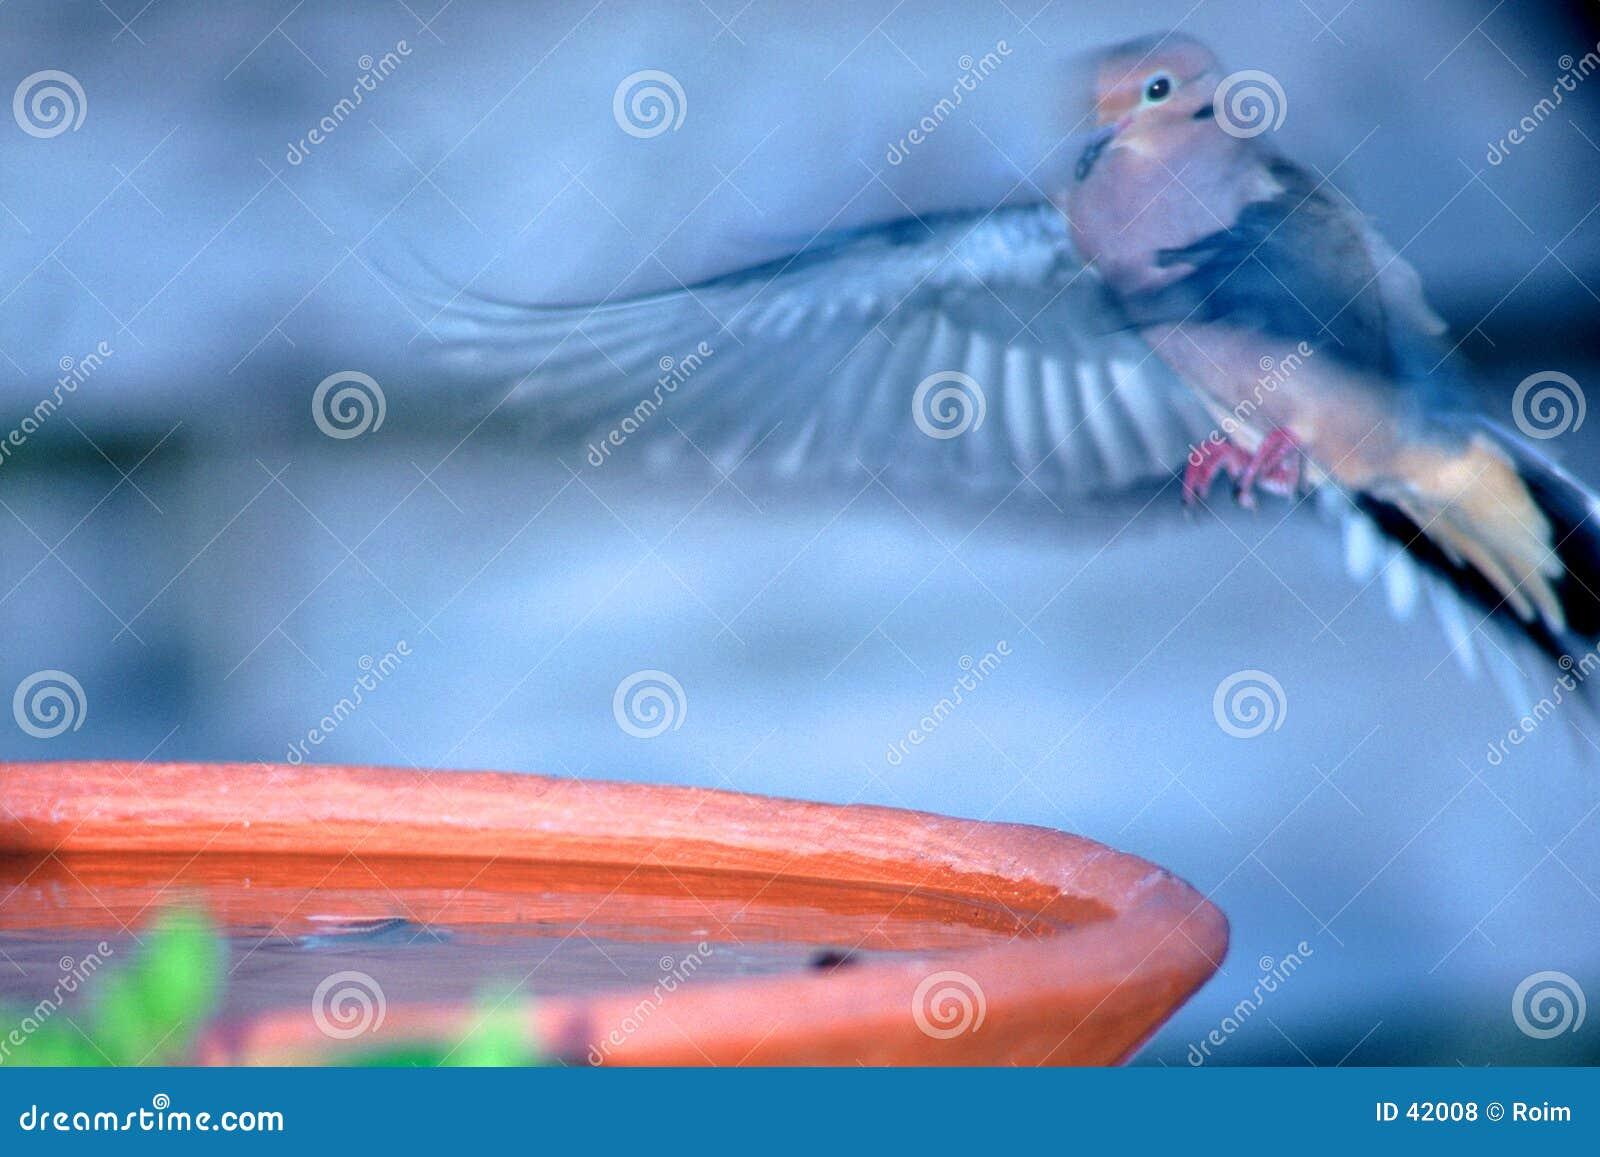 Landung am Vogel-Bad